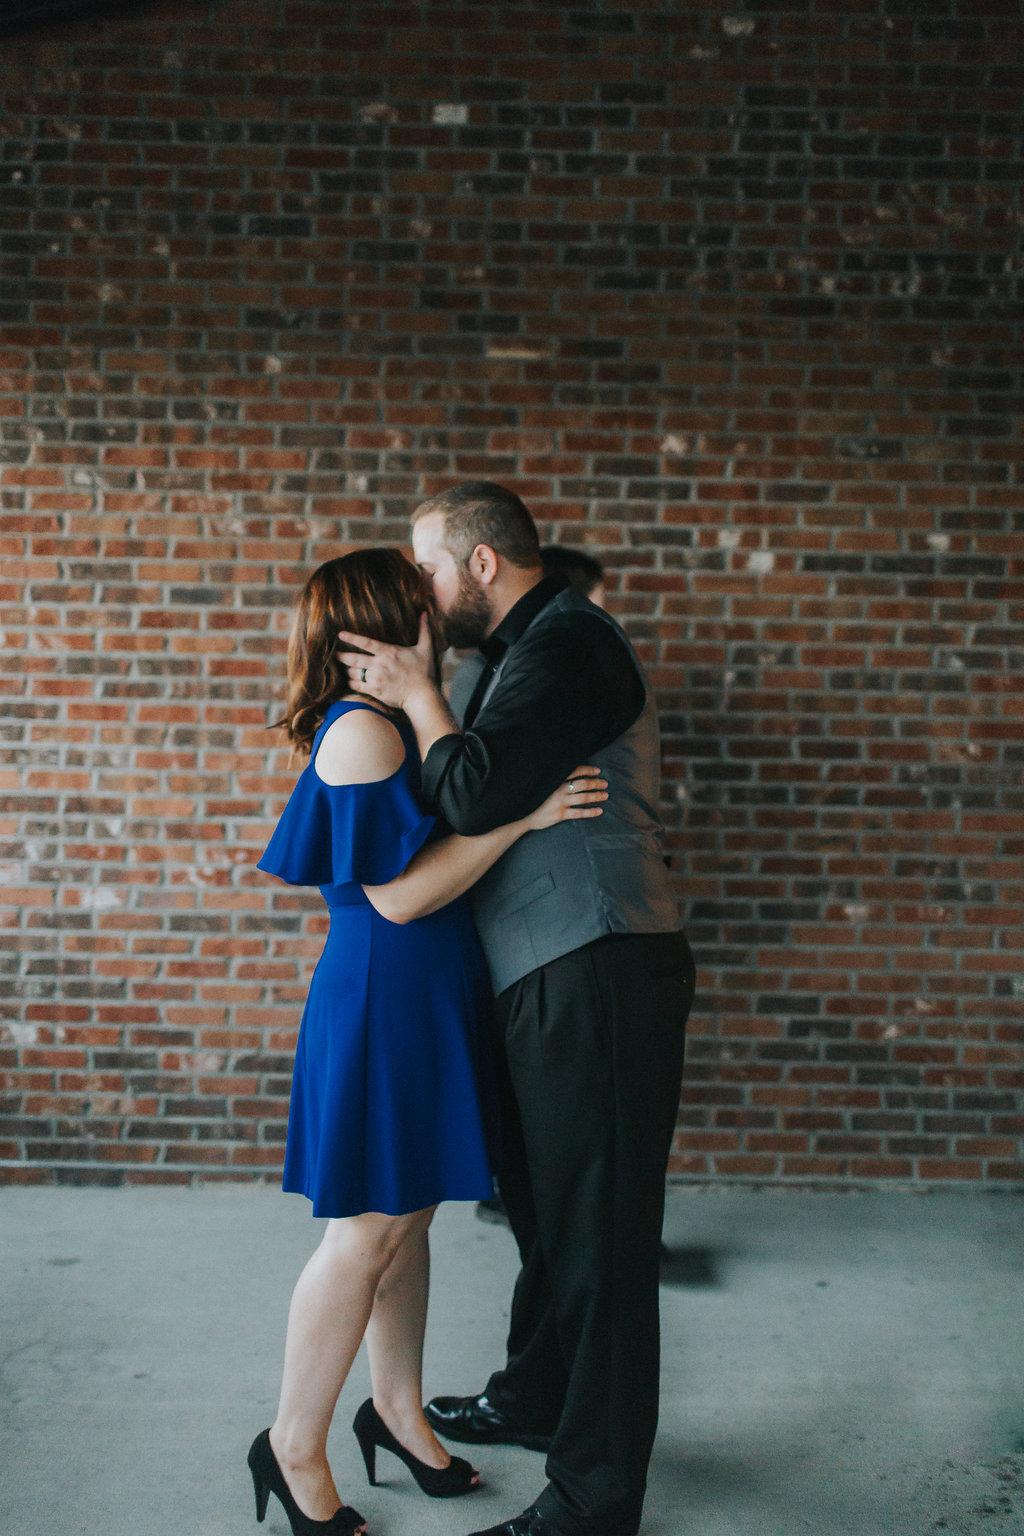 Tampa Elopement Coppertail Brewery Ybor Wedding Photographer_027.jpg